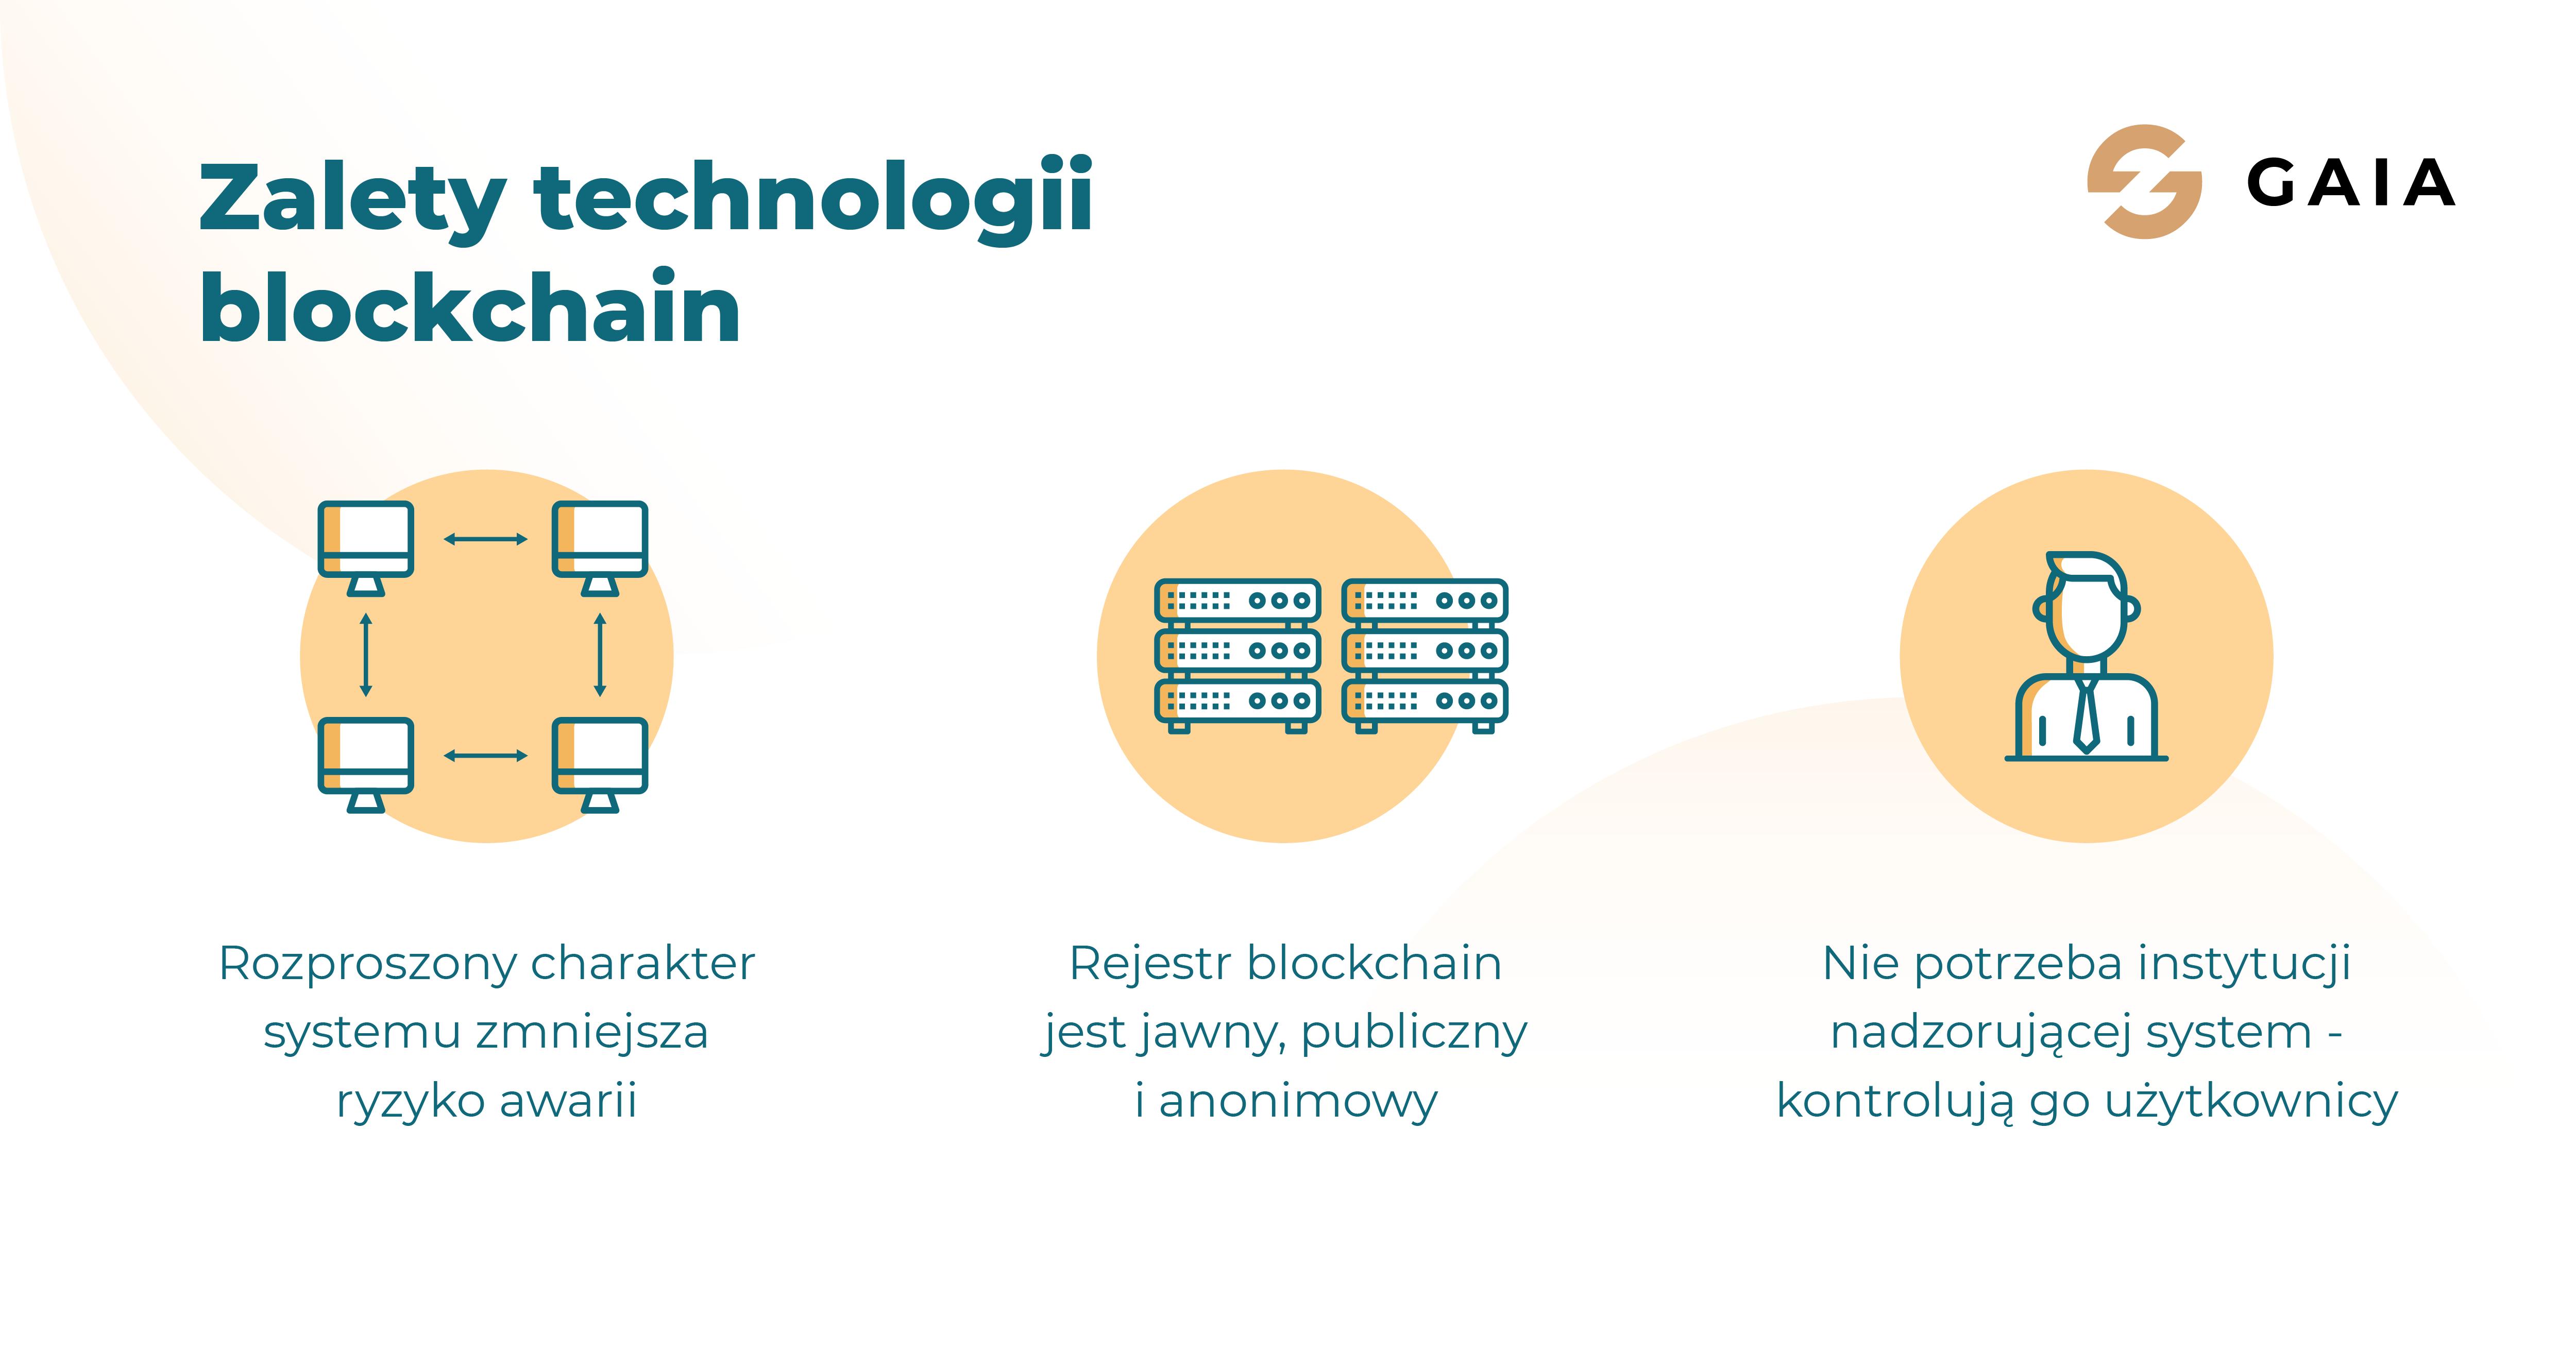 Zalety technologii blockchain